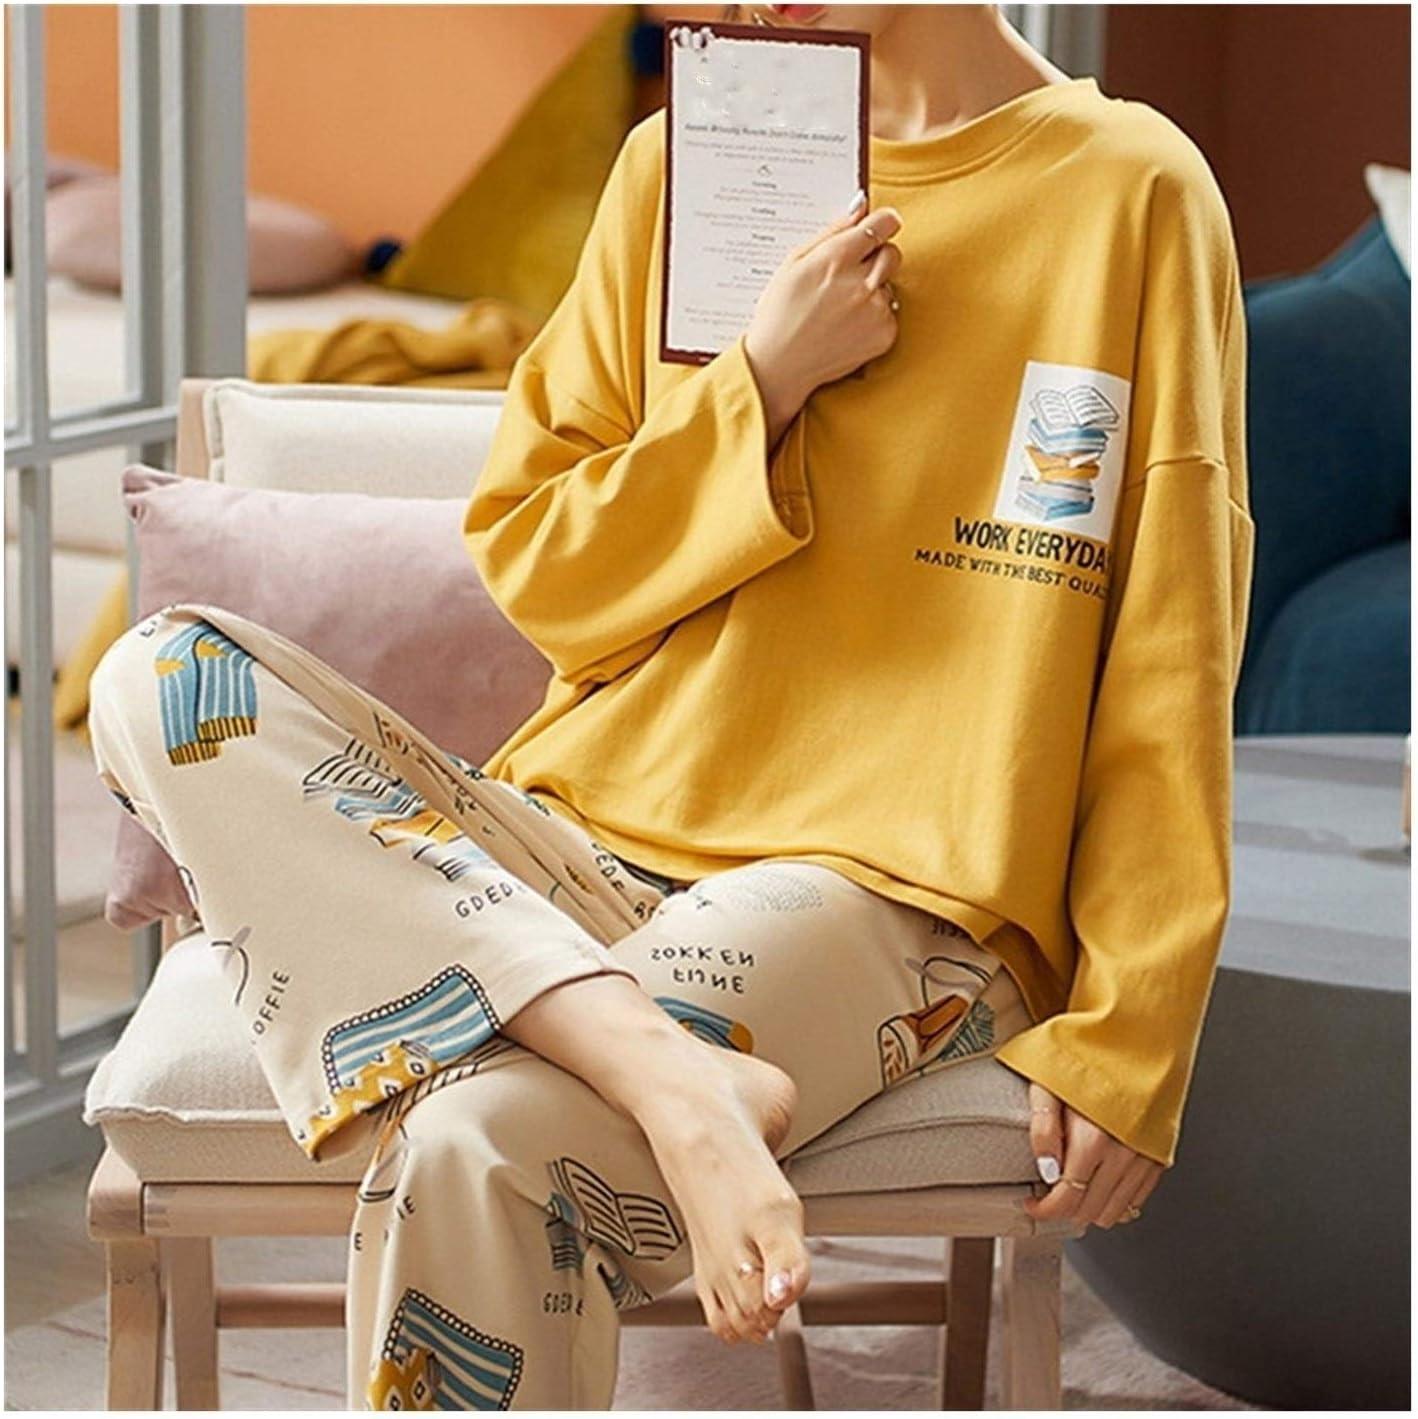 Adies pajamas matching pajama set 100% quality warranty for Mail order Pa women New Cotton Summer